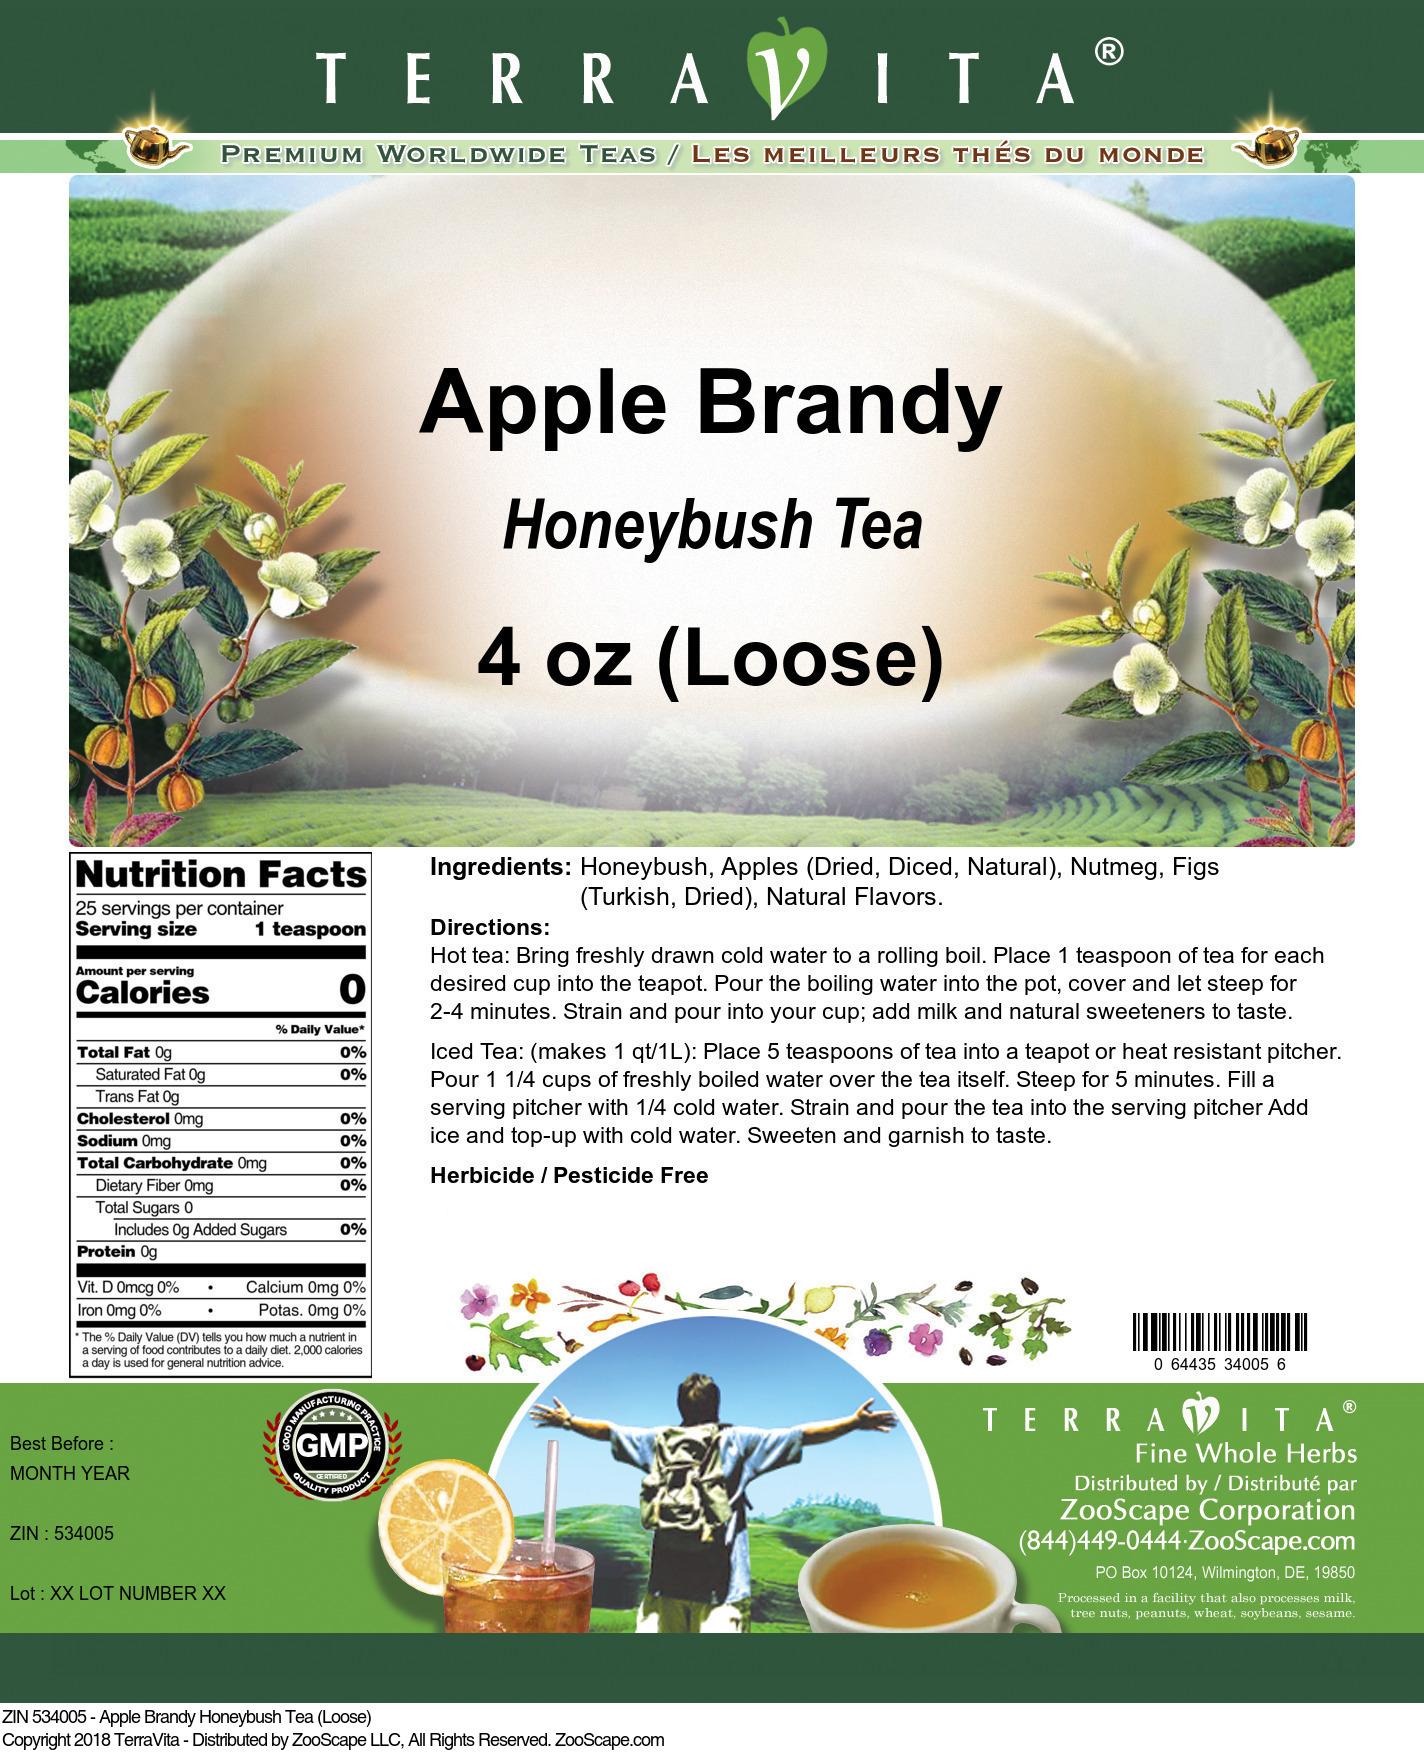 Apple Brandy Honeybush Tea